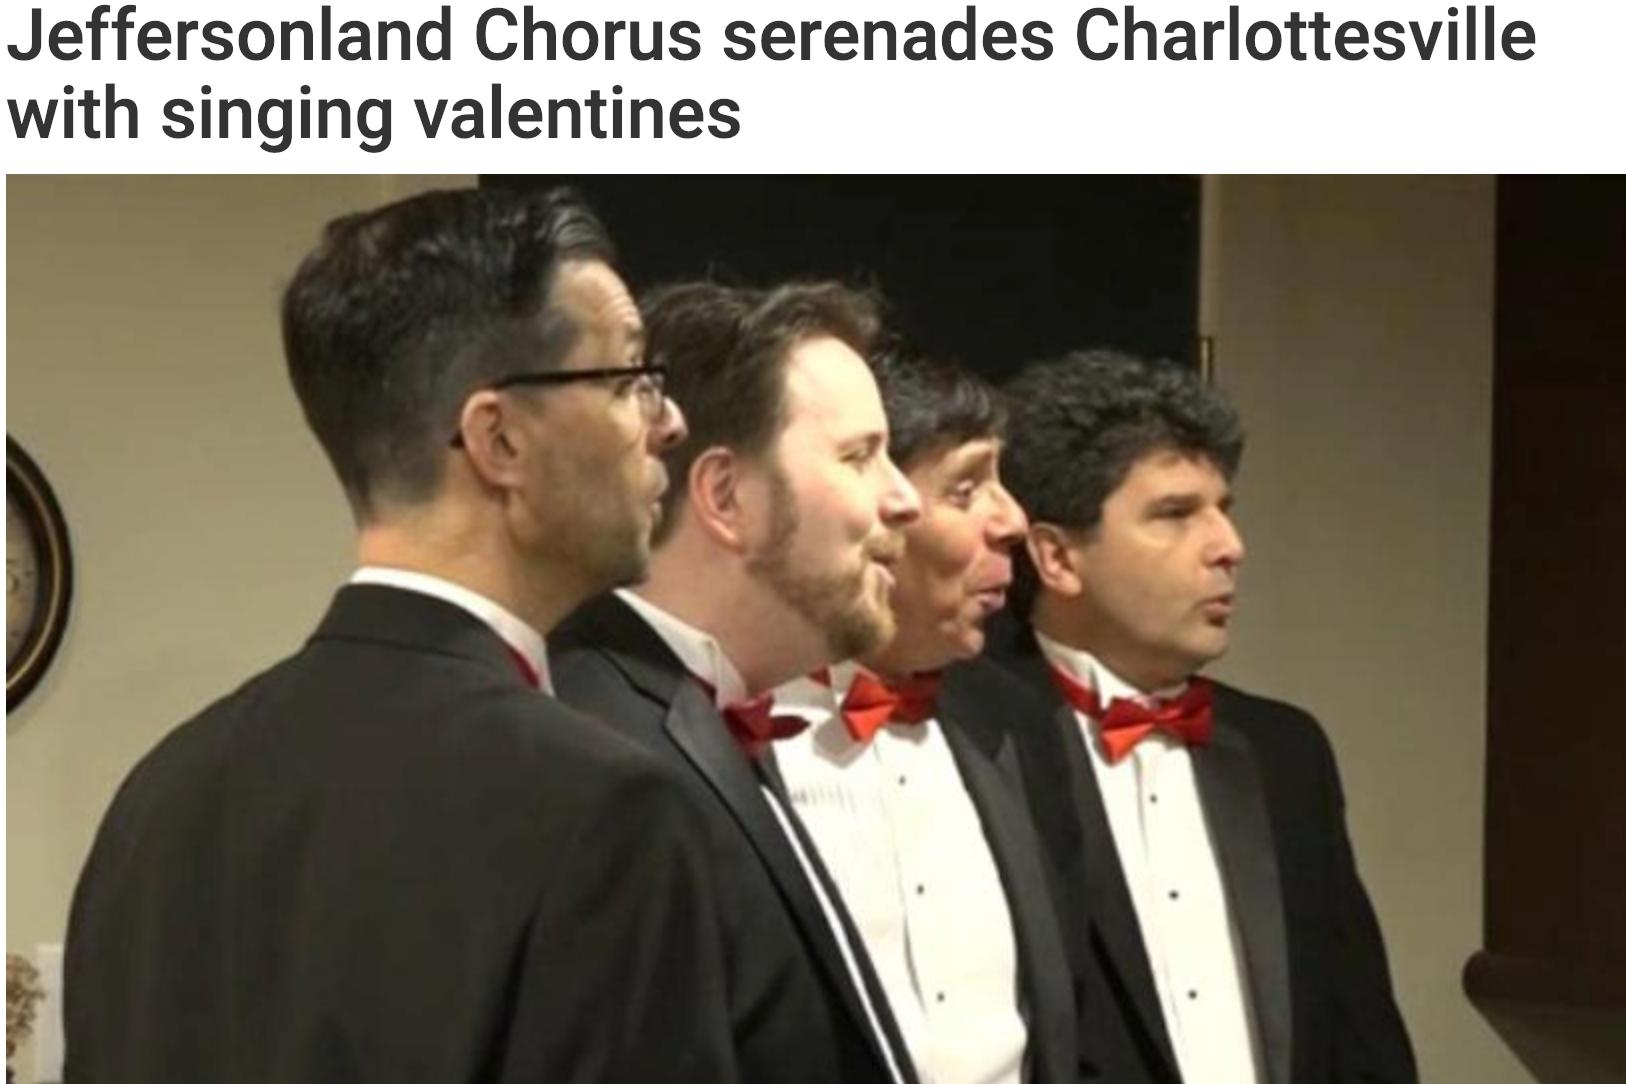 Jeffersonland_Chorus_serenades_Charlottesville_with_singing_valentines.png